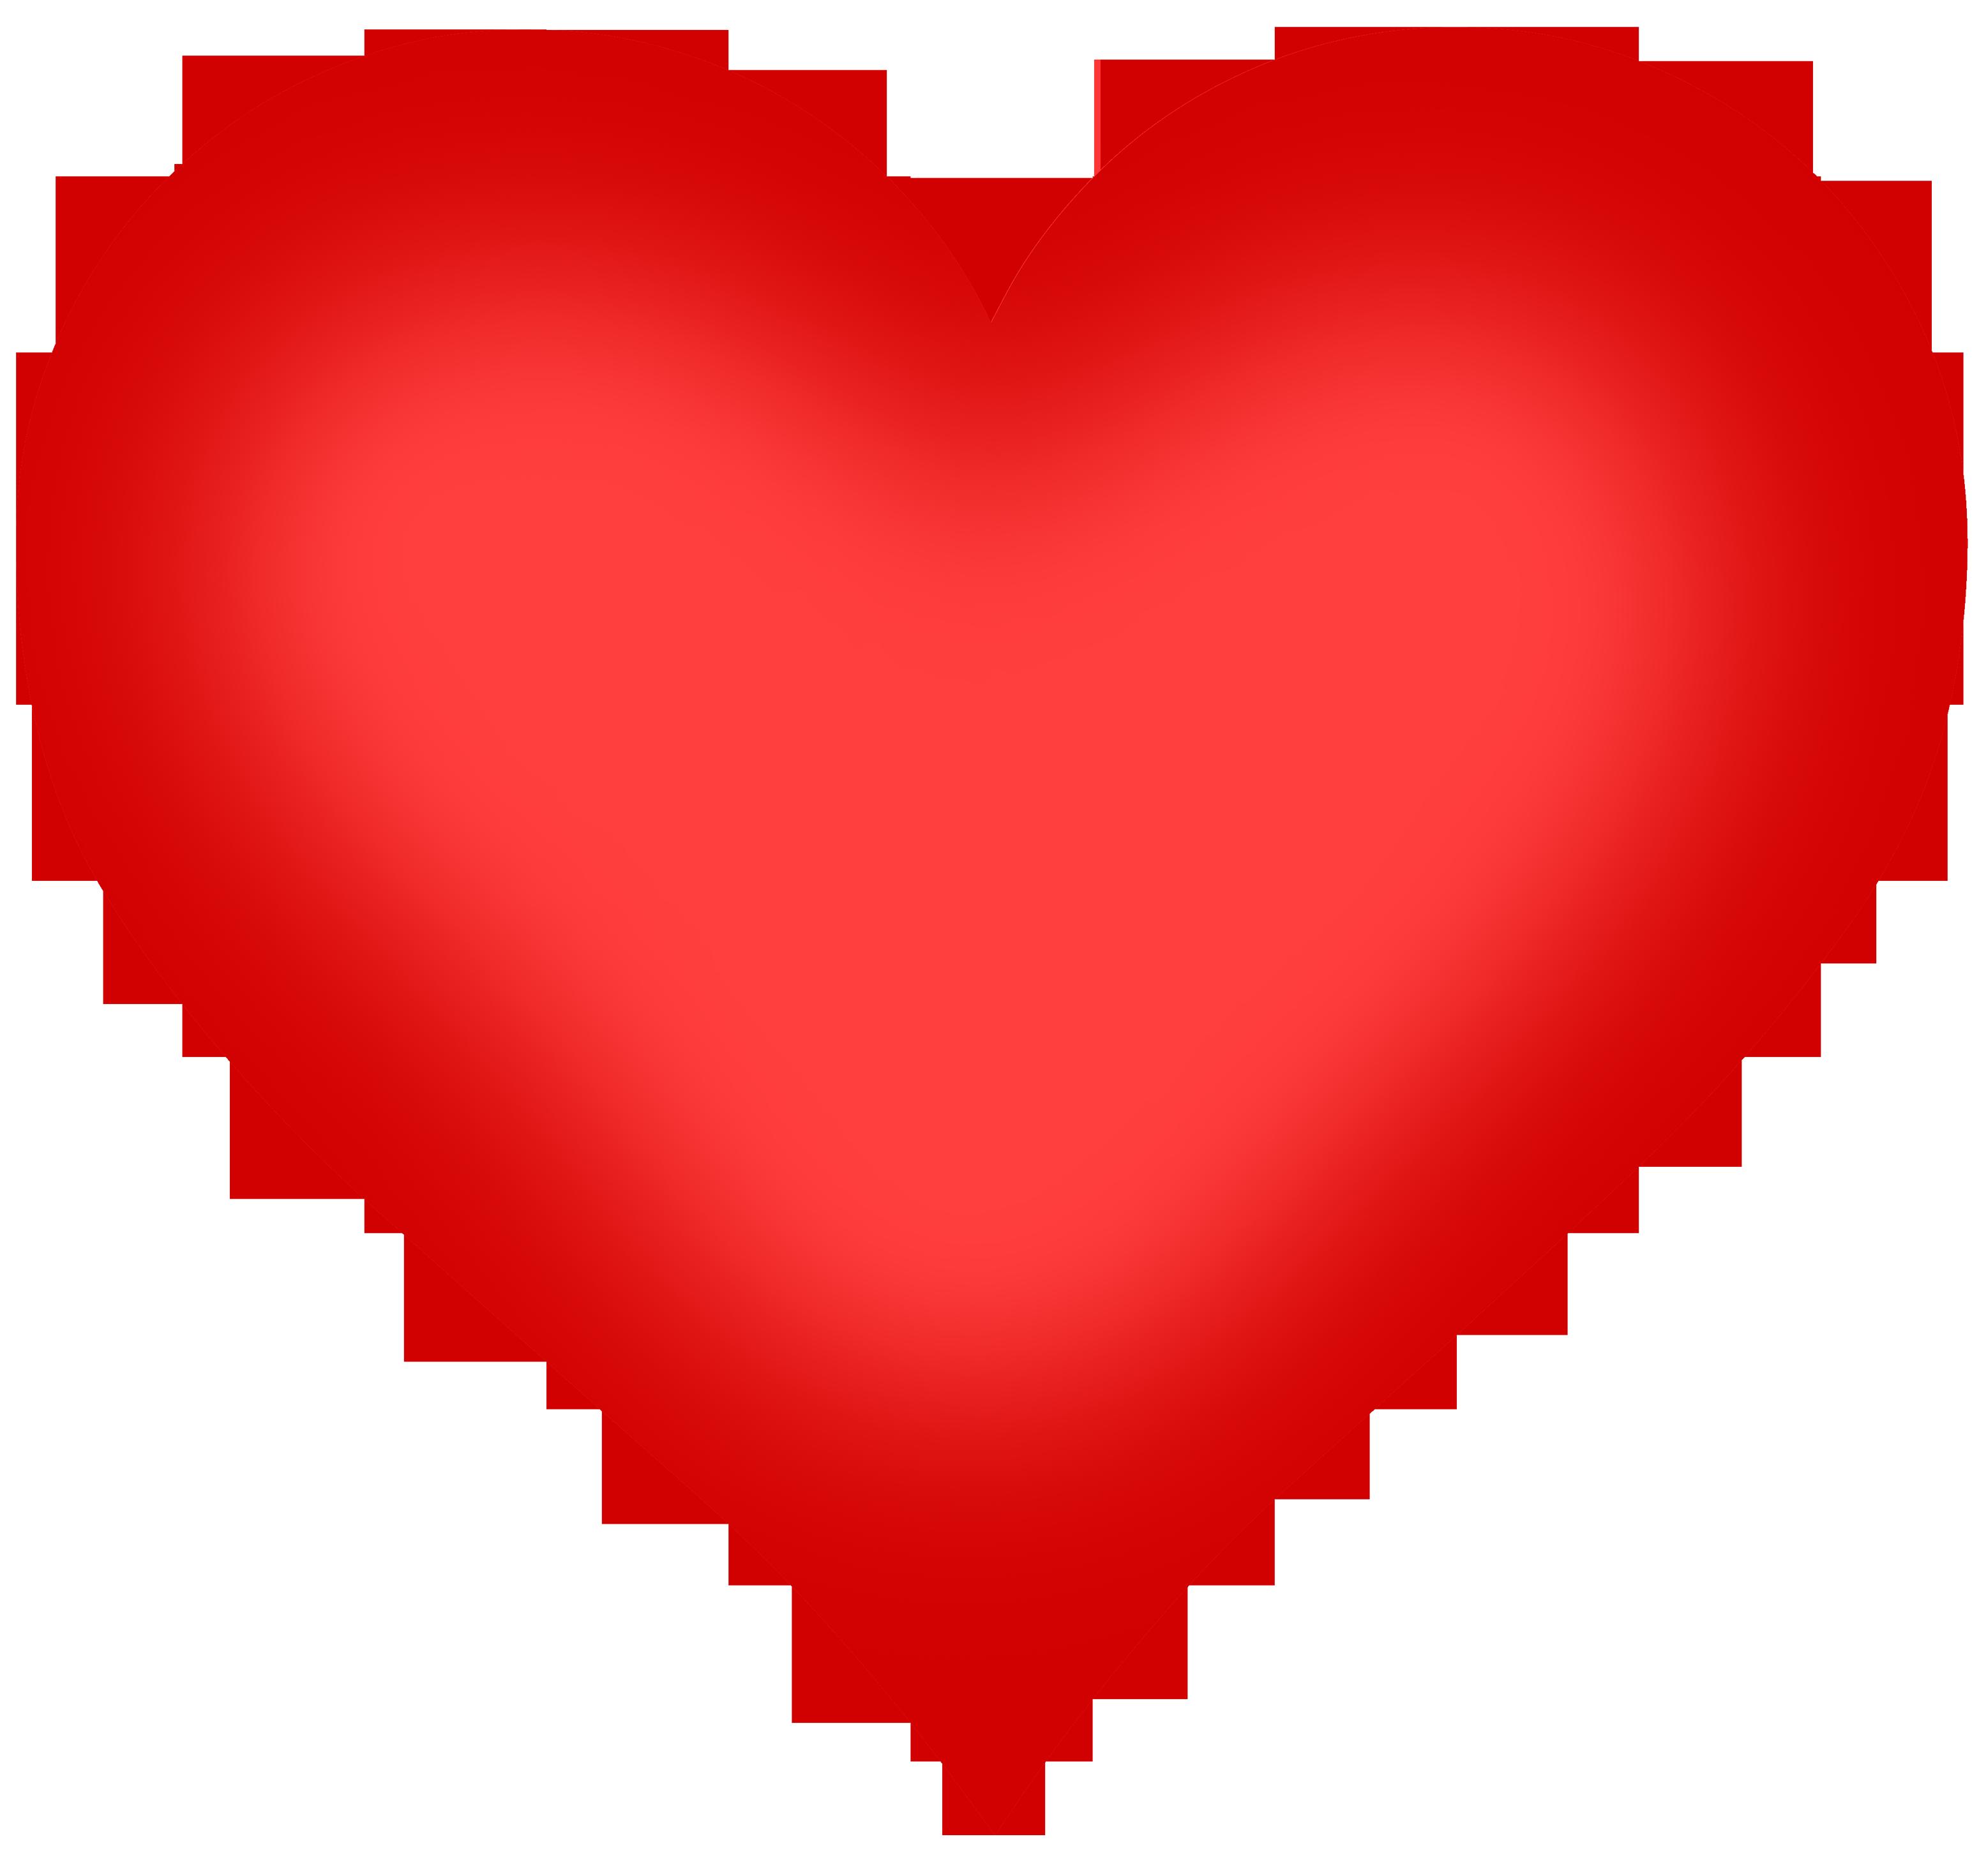 Heart Png Hdpng.com 3100 - Heart, Transparent background PNG HD thumbnail